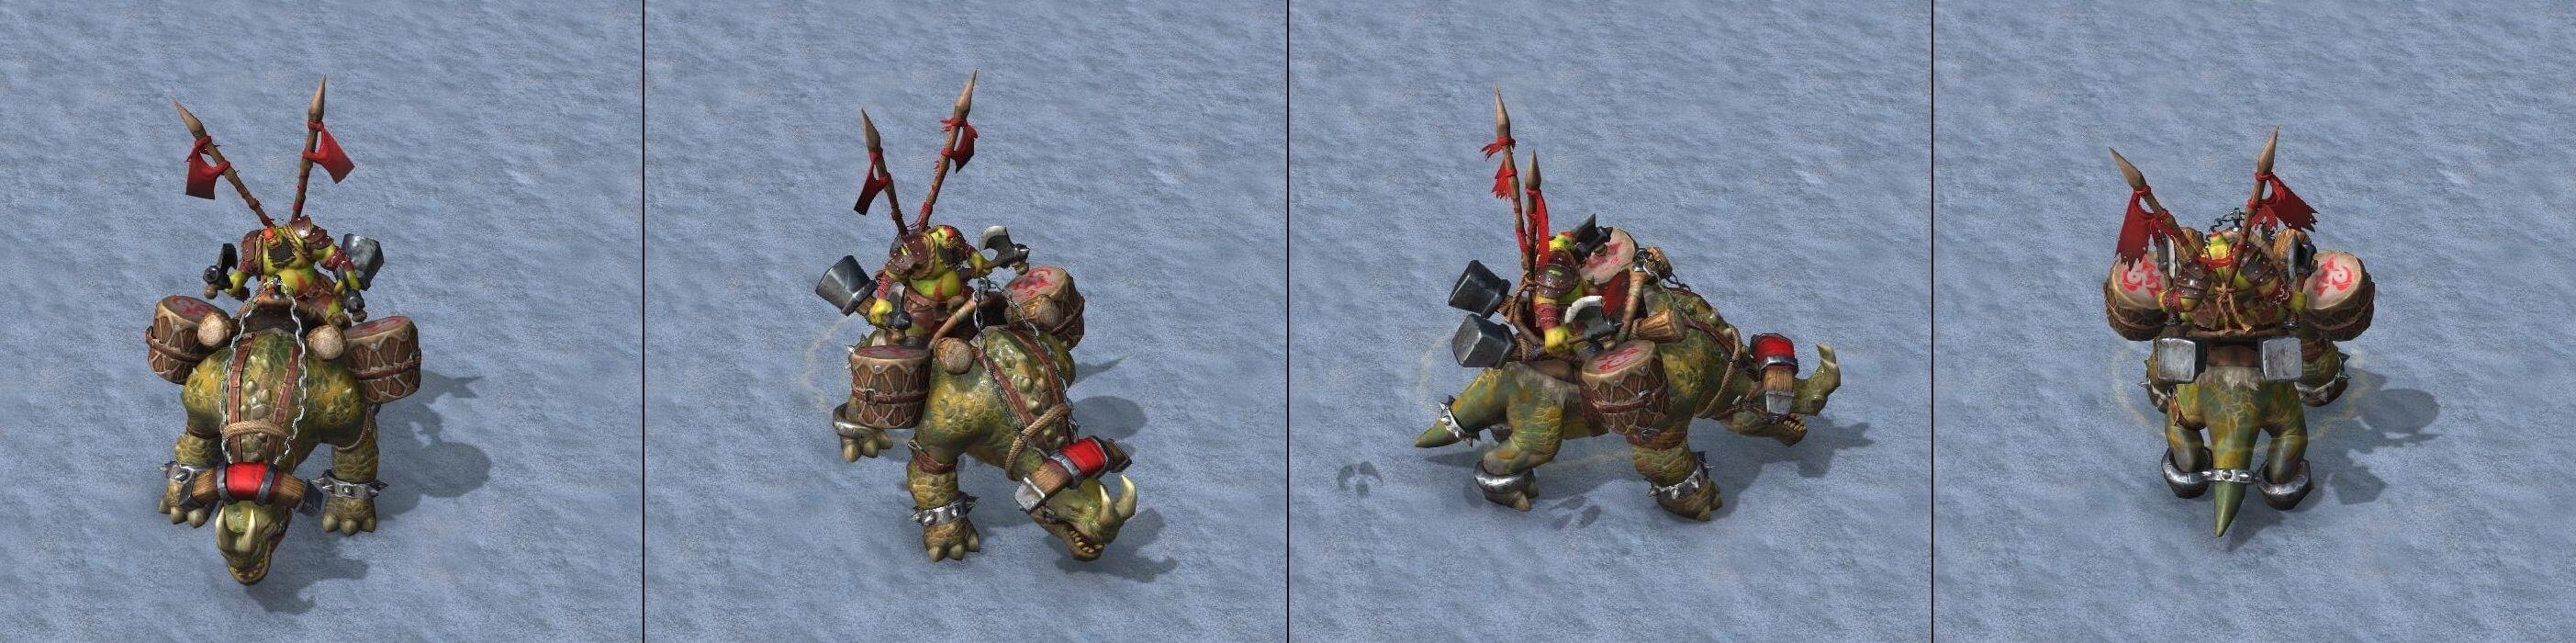 Наездник на кодо Warcraft lll